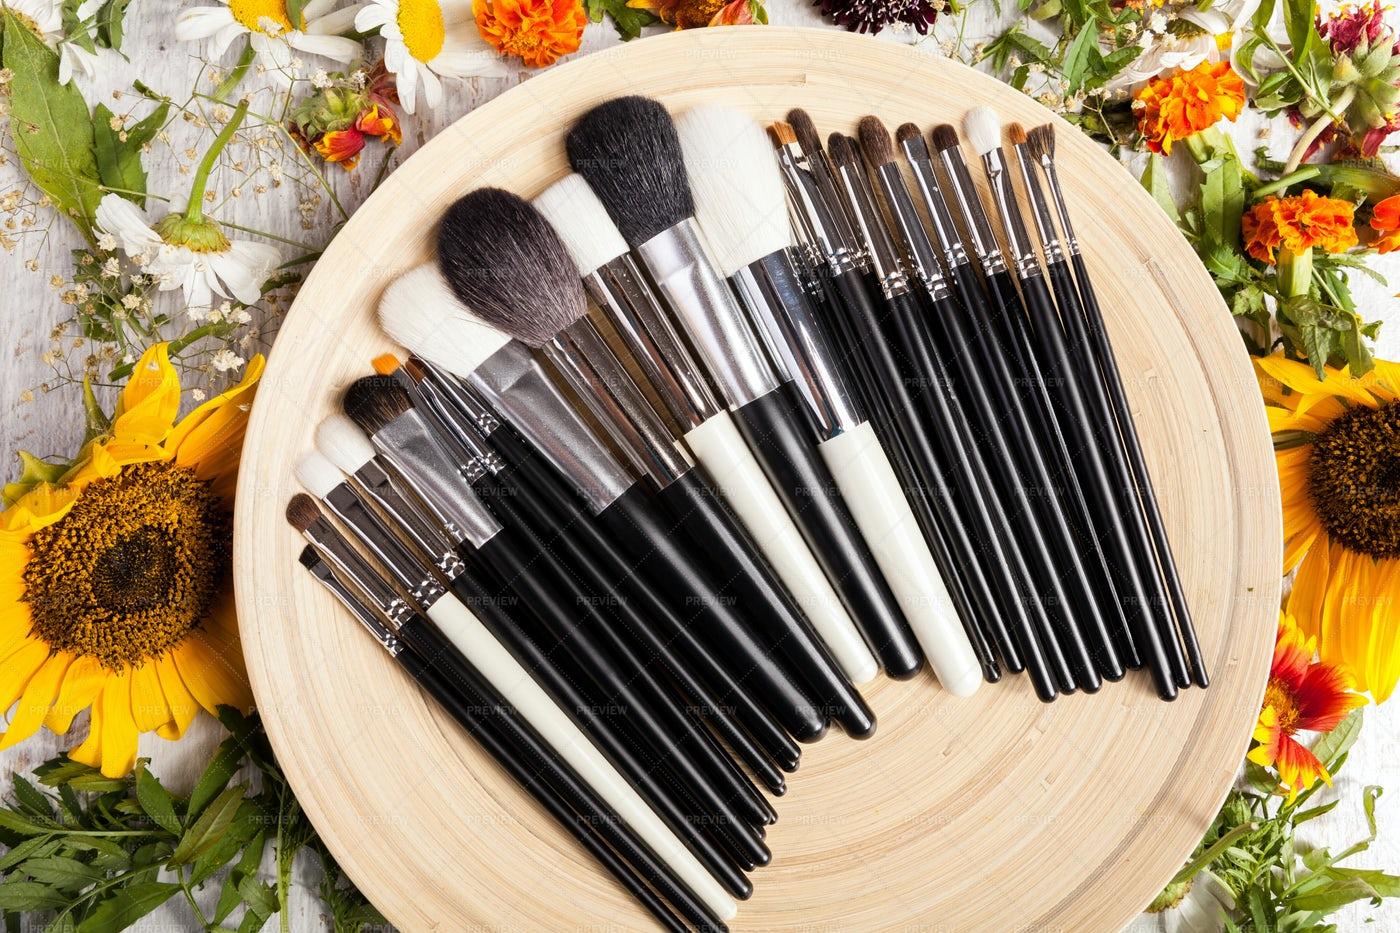 Plate Of Makeup Brushes: Stock Photos